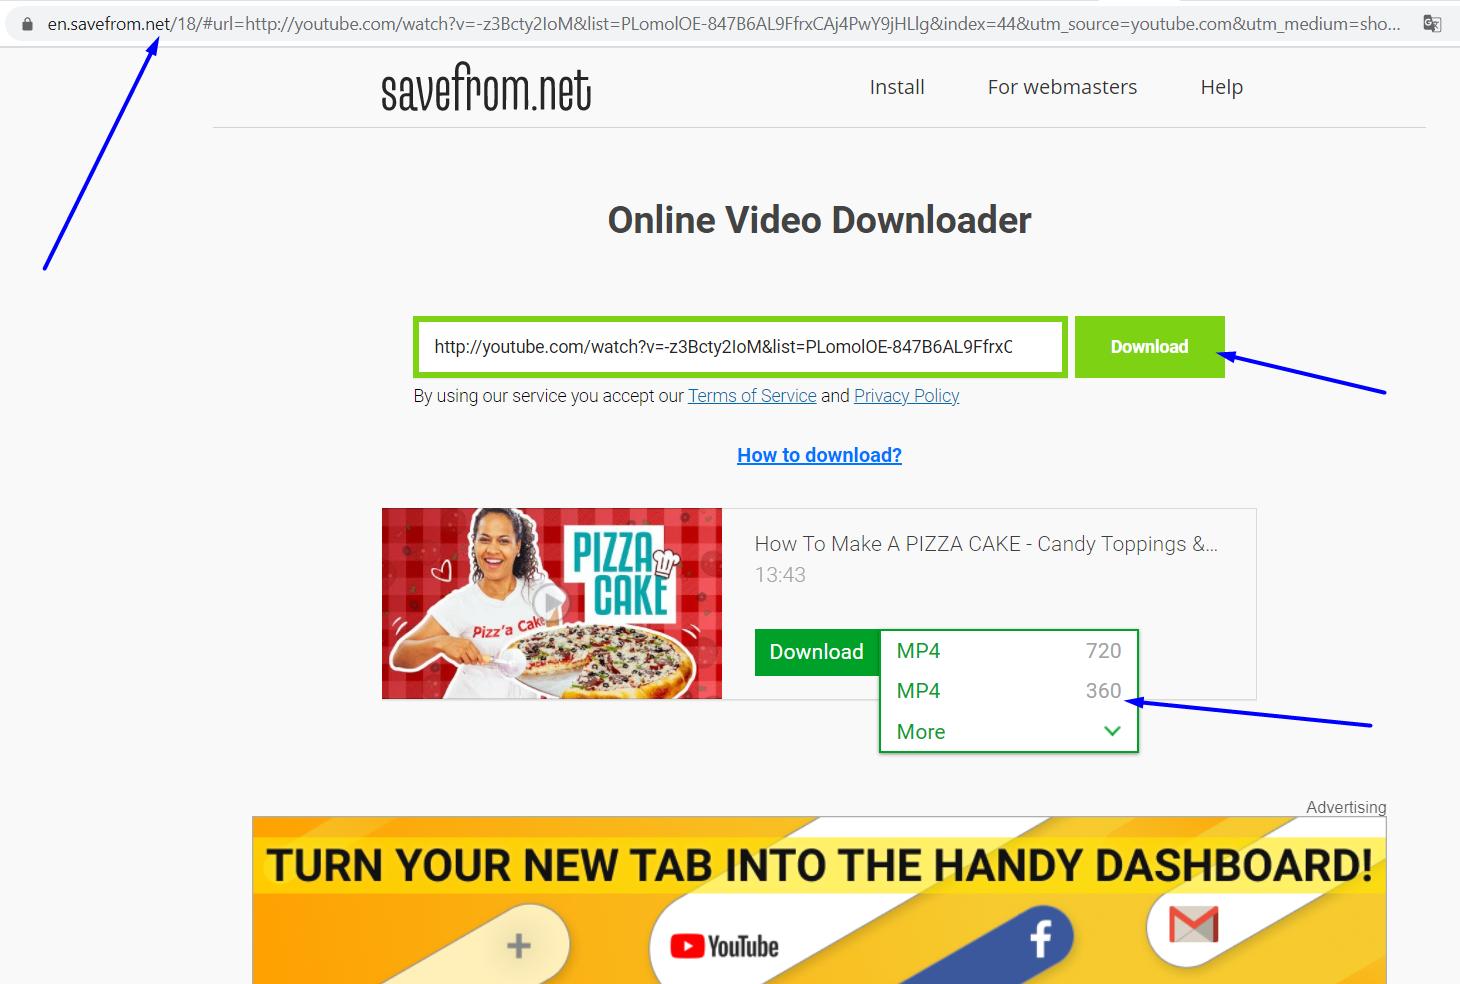 savefrom.net step 3